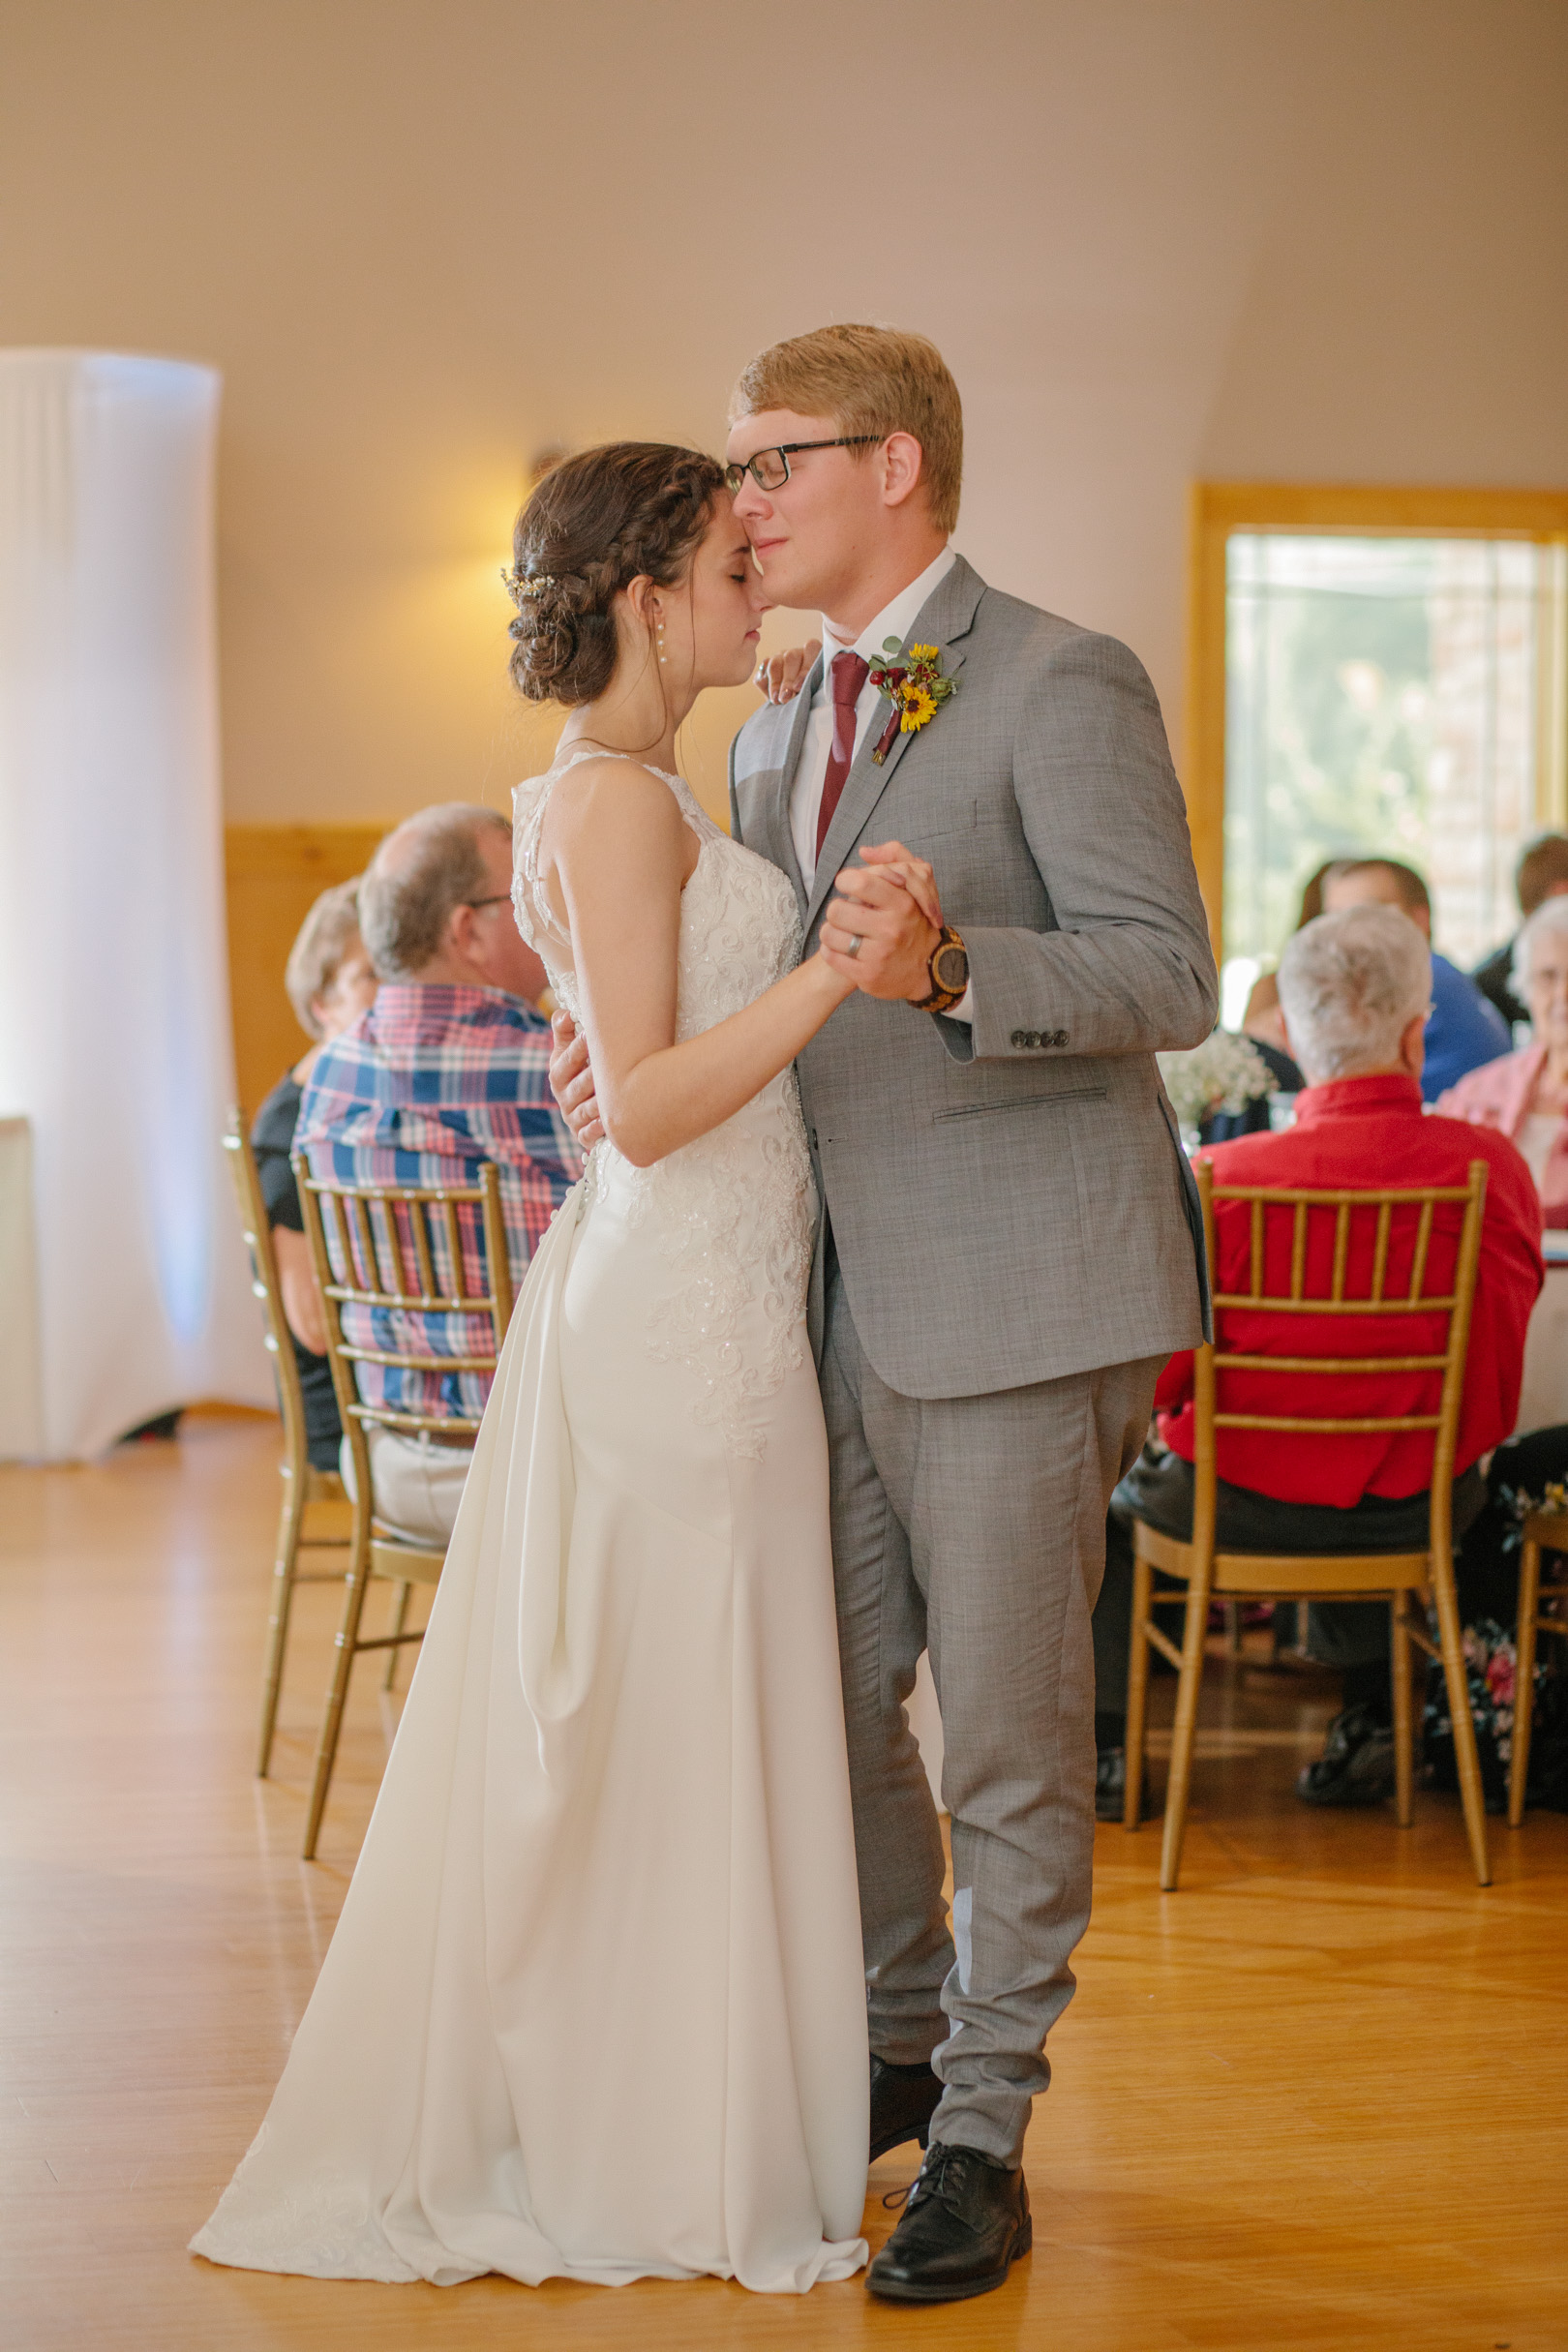 gabby_david_the_chateau_white_oak_wedding_70.jpg